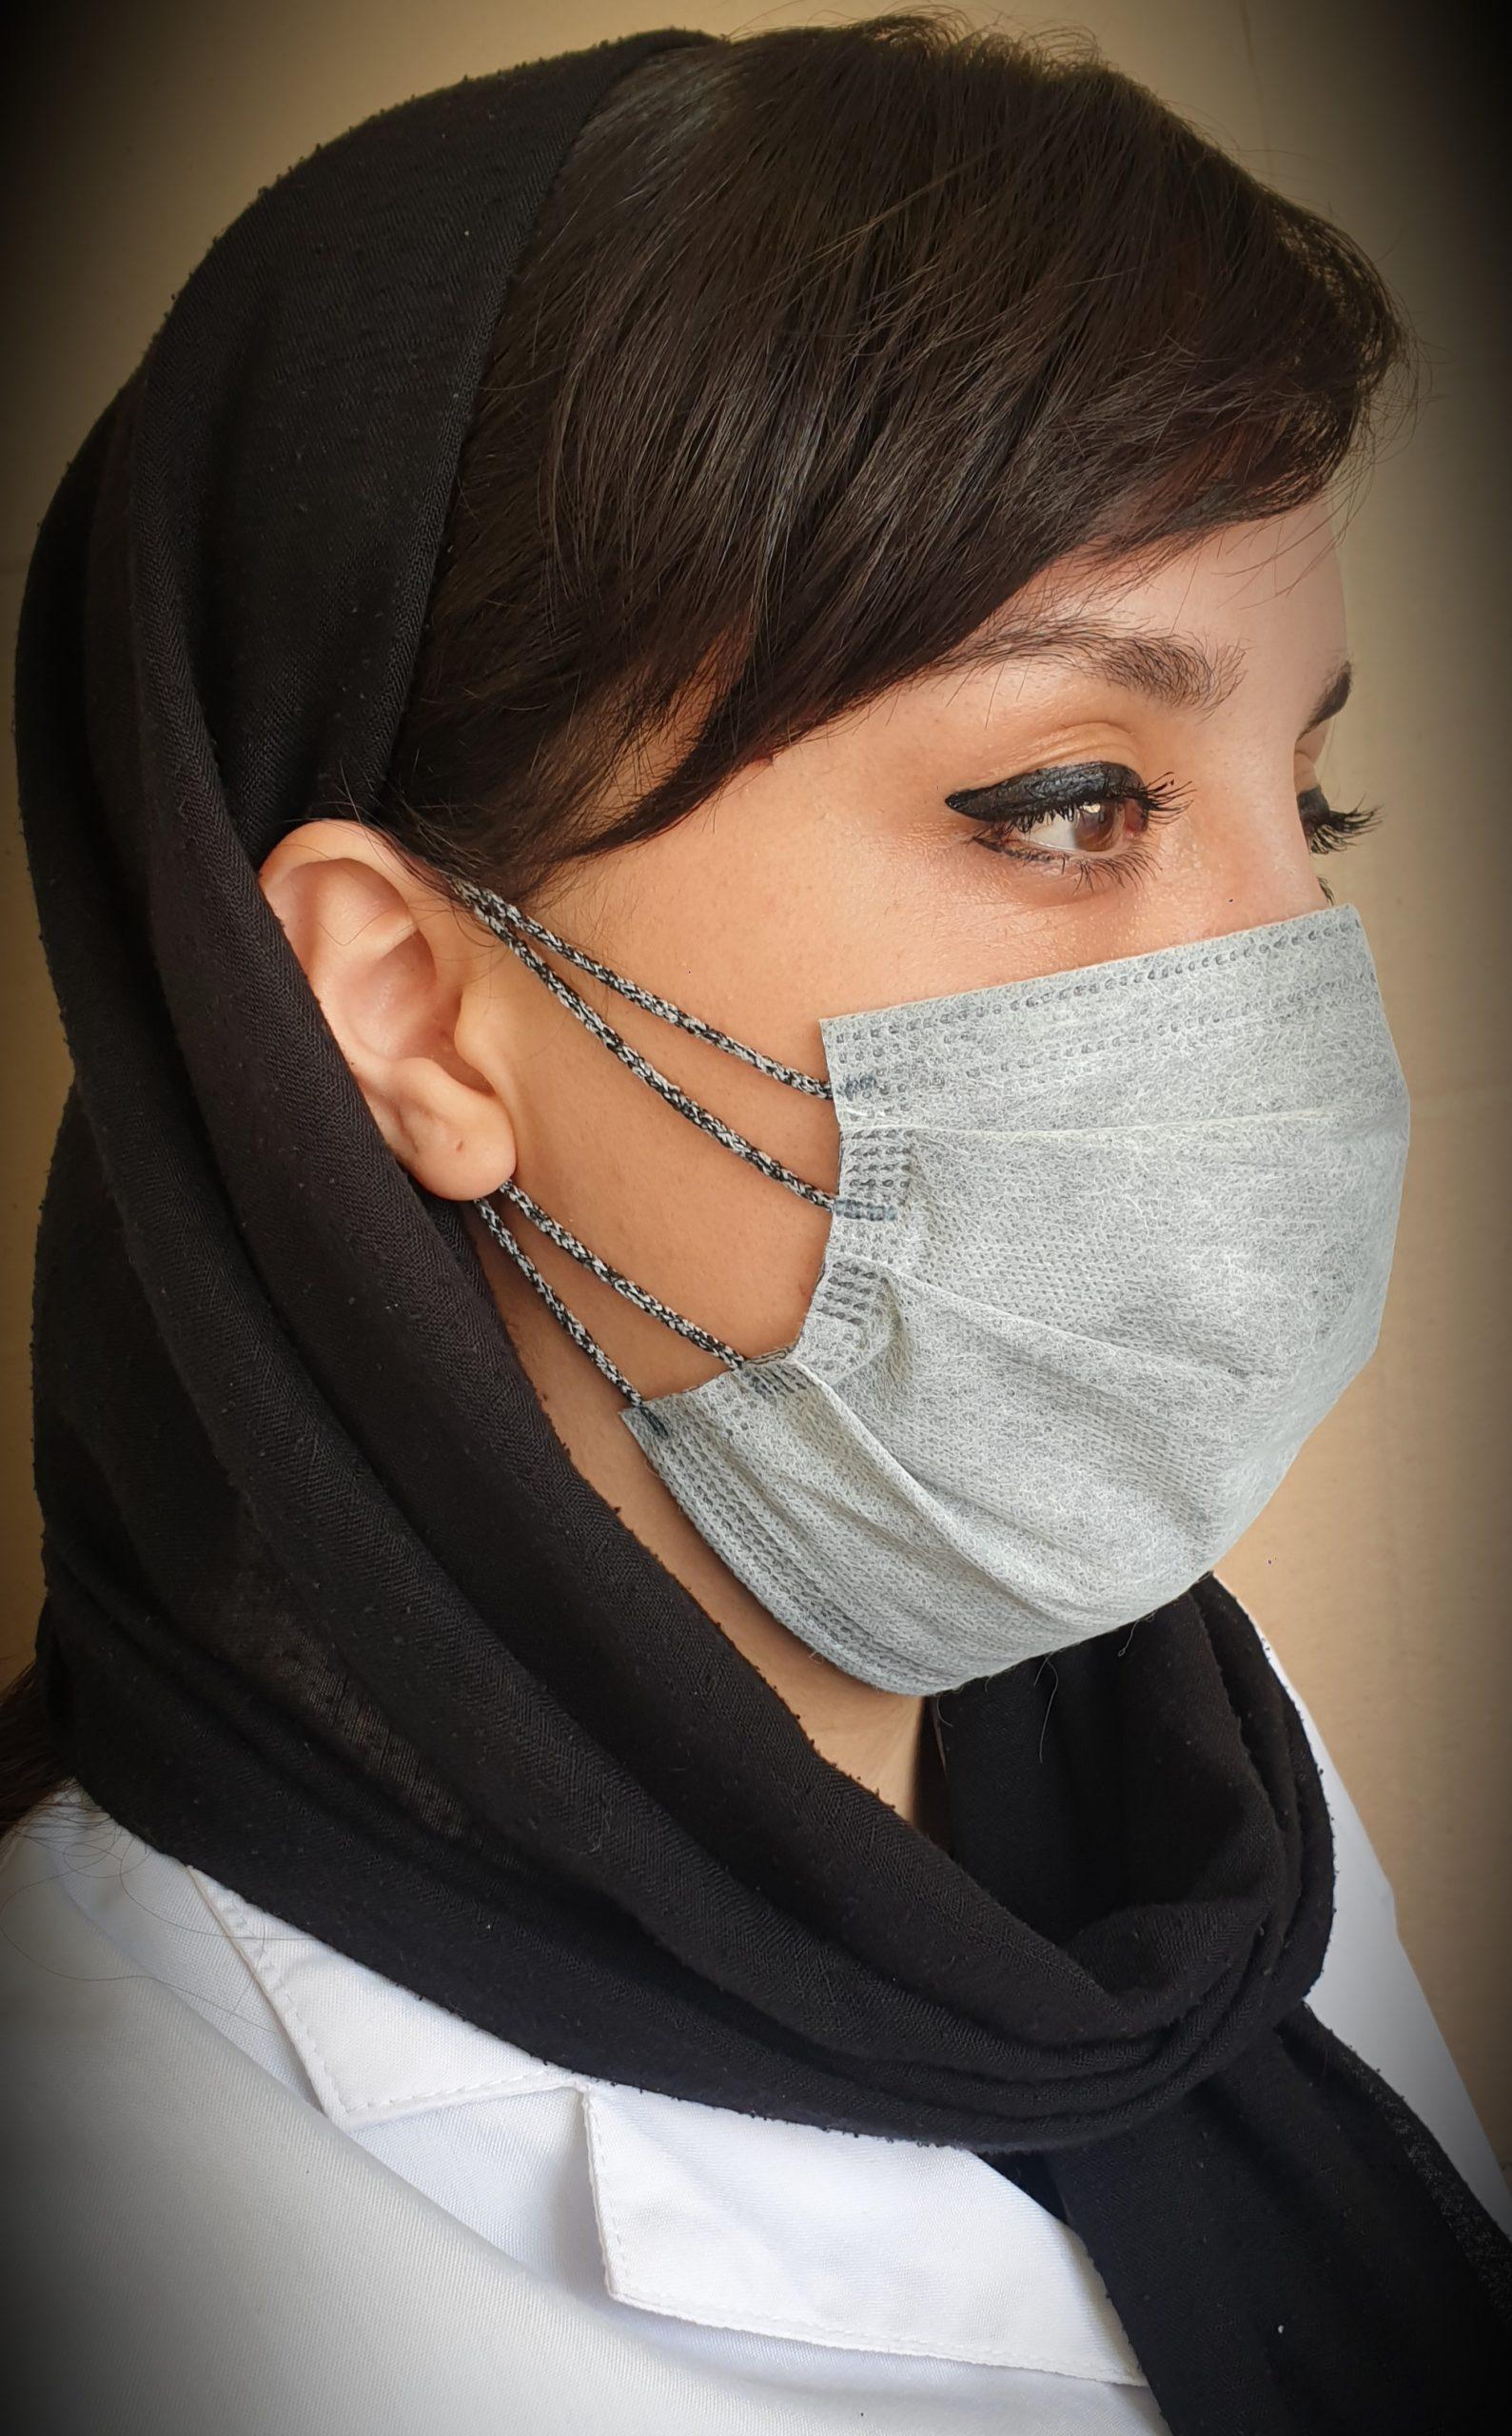 ماسک سه لایه ۴ کش (Super Face Mask) رنگ طوسی بسته ۱۵ عددی